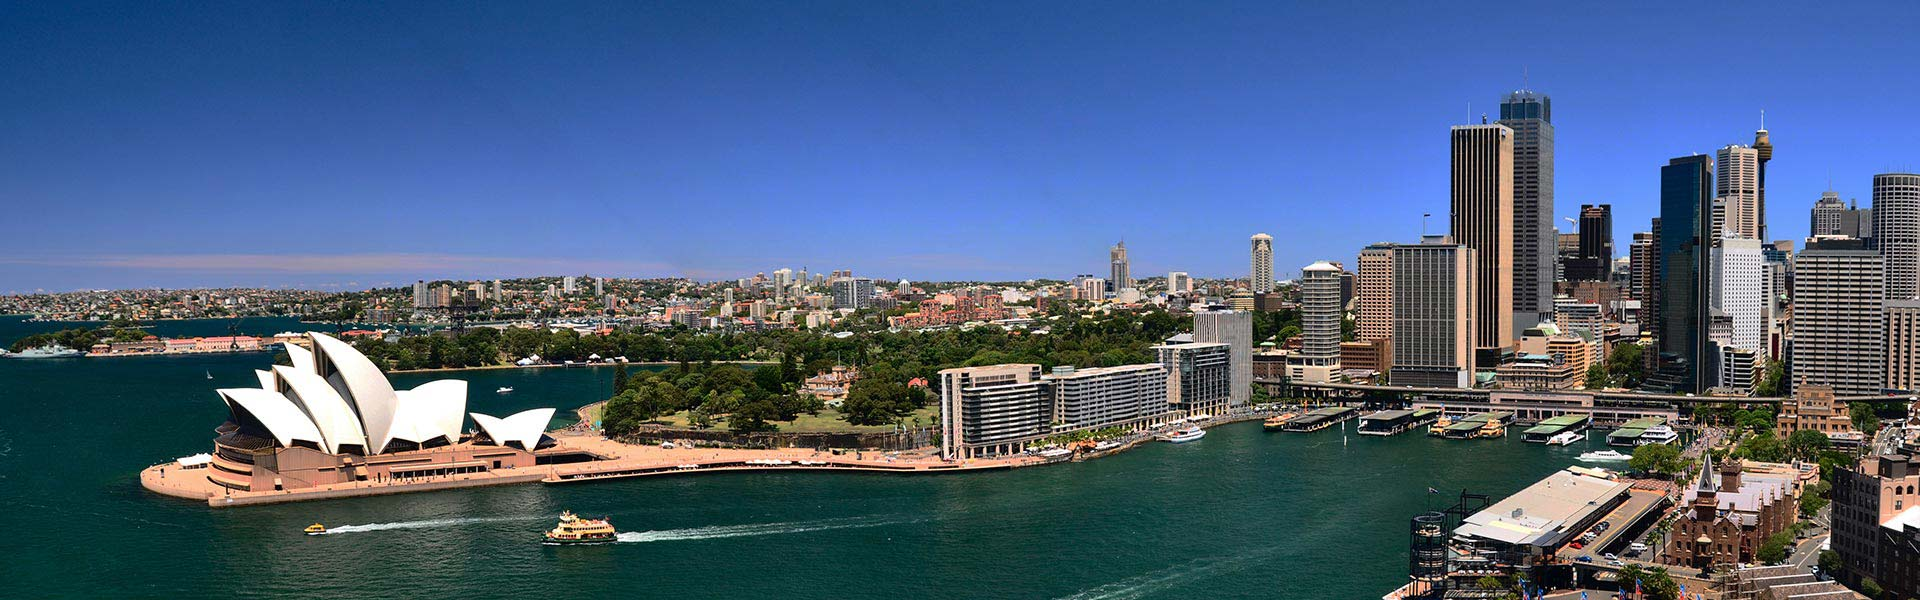 Sydney Harbour Panorama Big Bus Tours